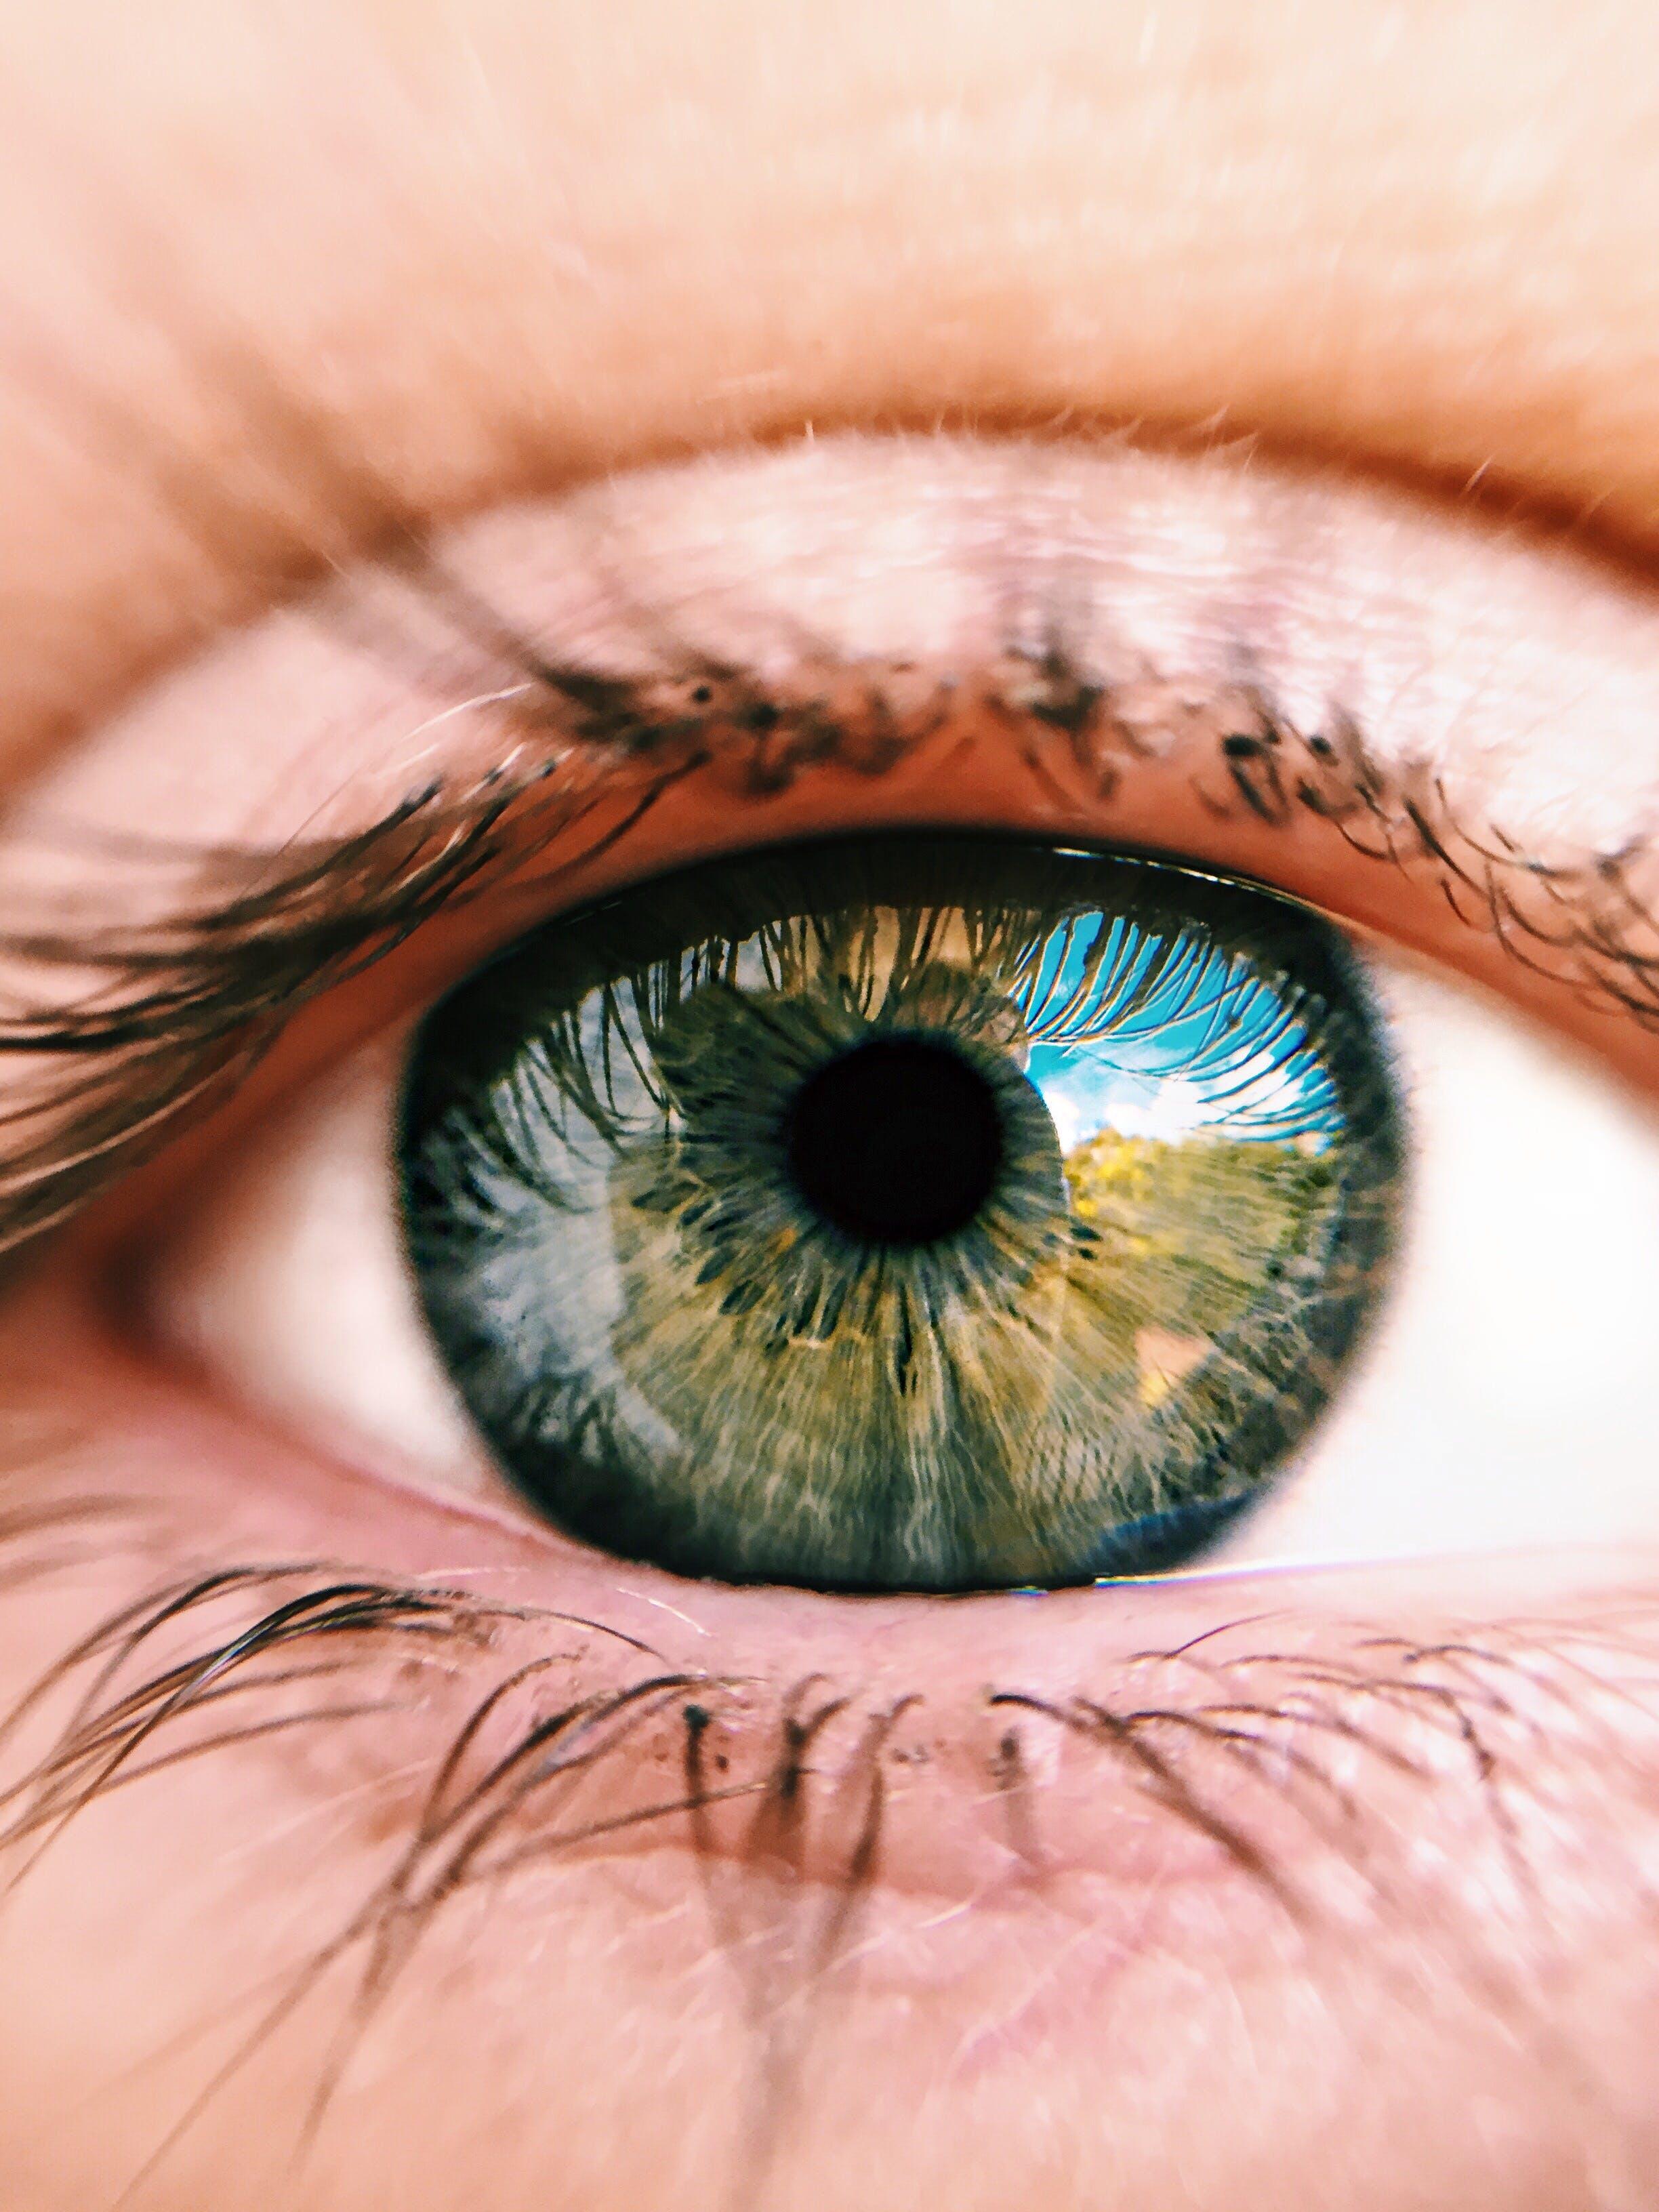 de alumno, córnea, globo ocular, iris